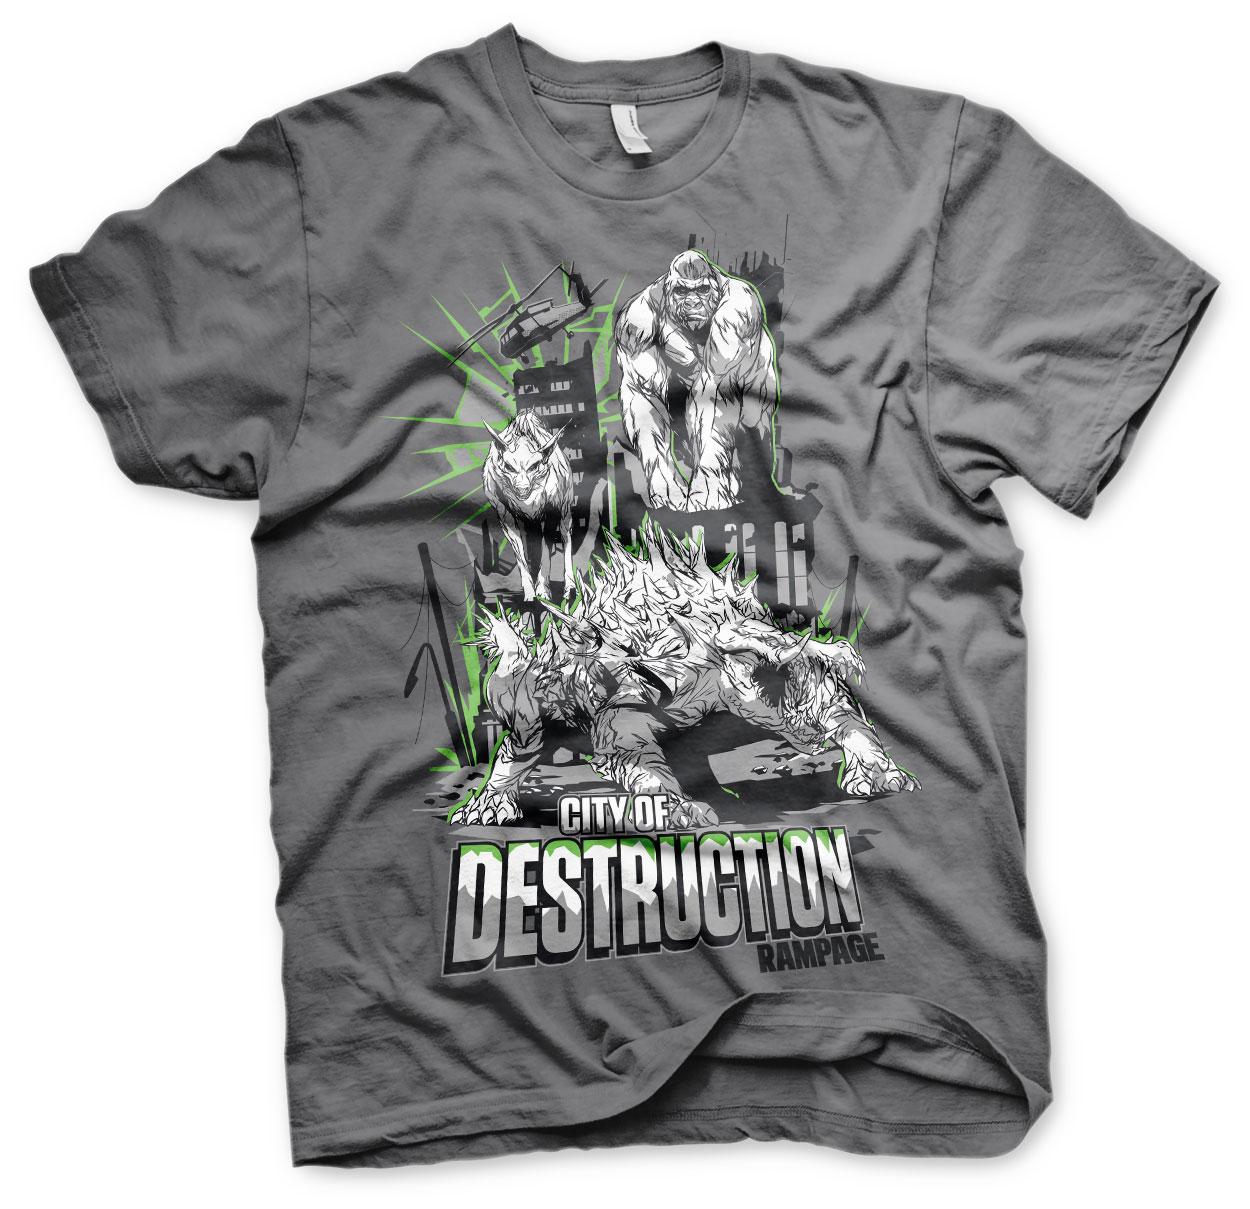 Rampage - Destruction City T-Shirt